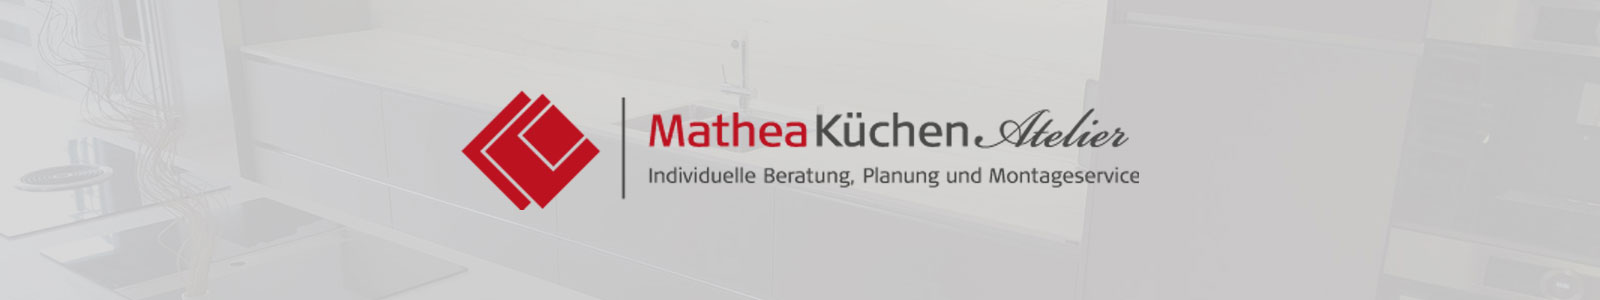 kuechenguide.com-mathea-banner